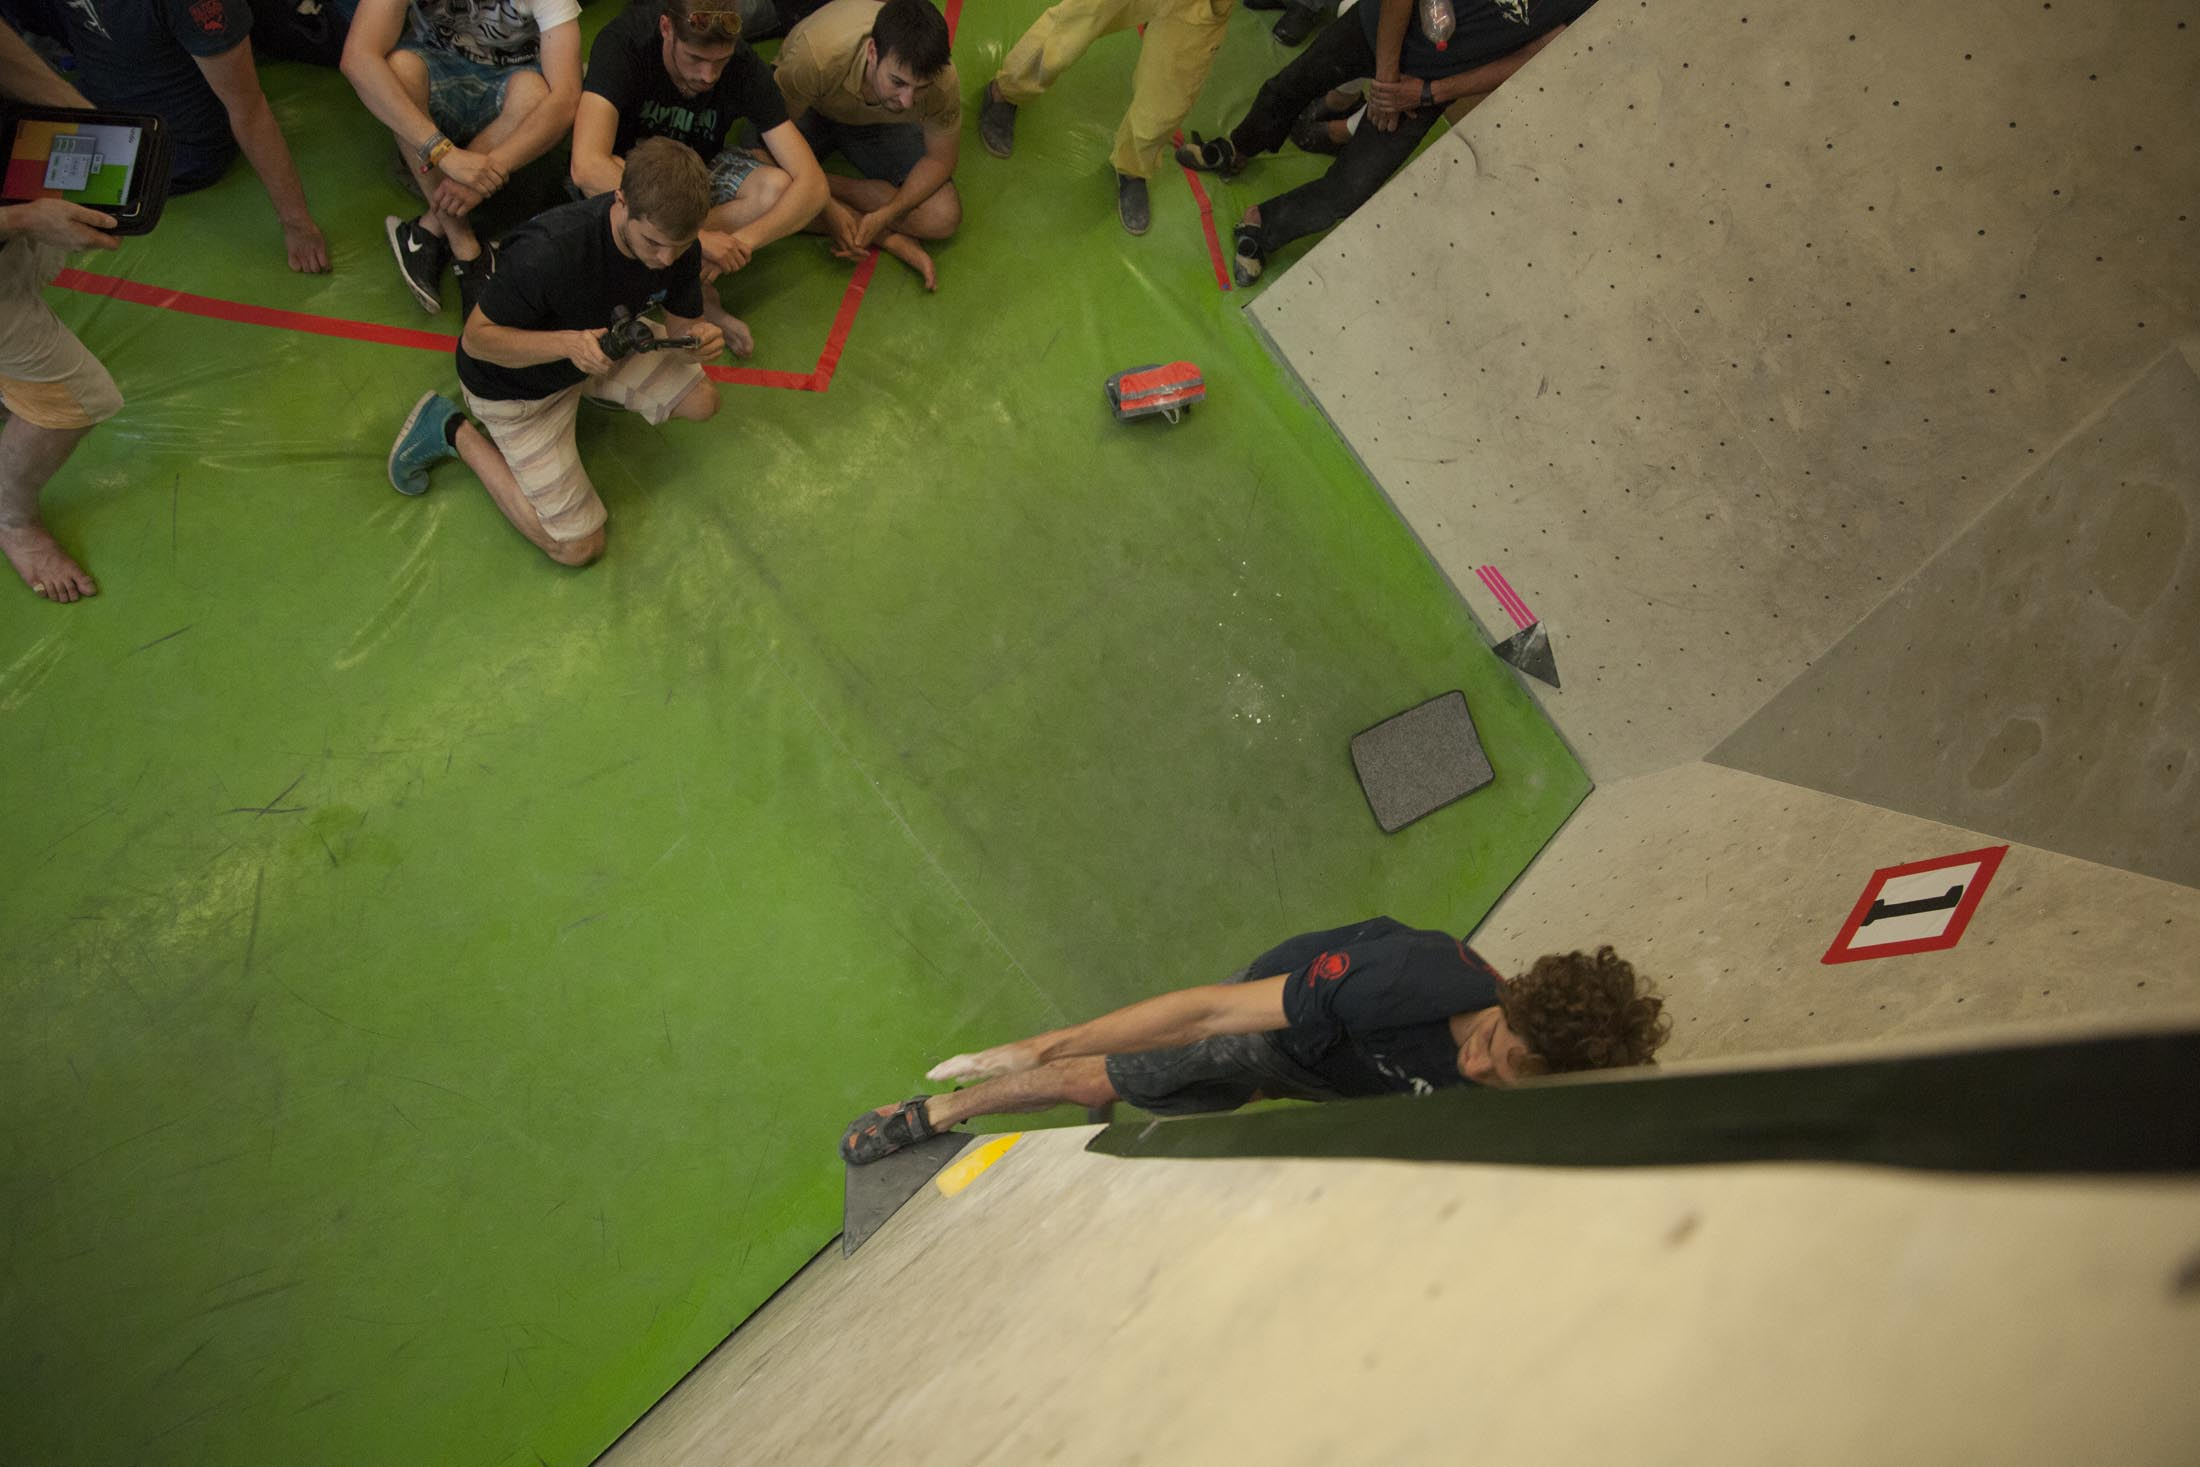 Finale, internationaler bouldercup Frankenjura 2016, BLOCKHELDEN Erlangen, Mammut, Bergfreunde.de, Boulderwettkampf07092016461